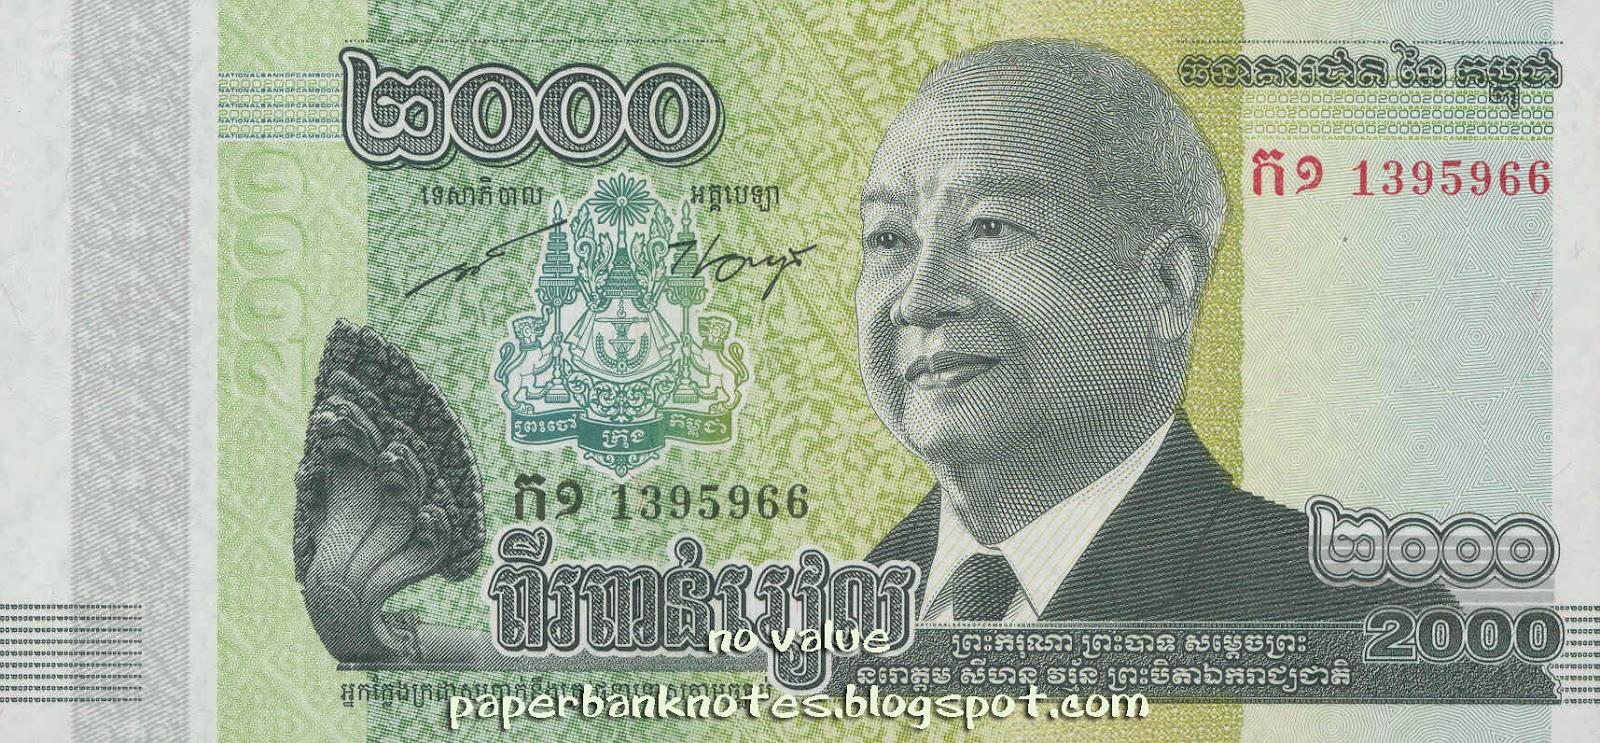 http://seabanknotes.blogspot.com/2014/03/cambodia-2000-riels-commemorative-60th.html